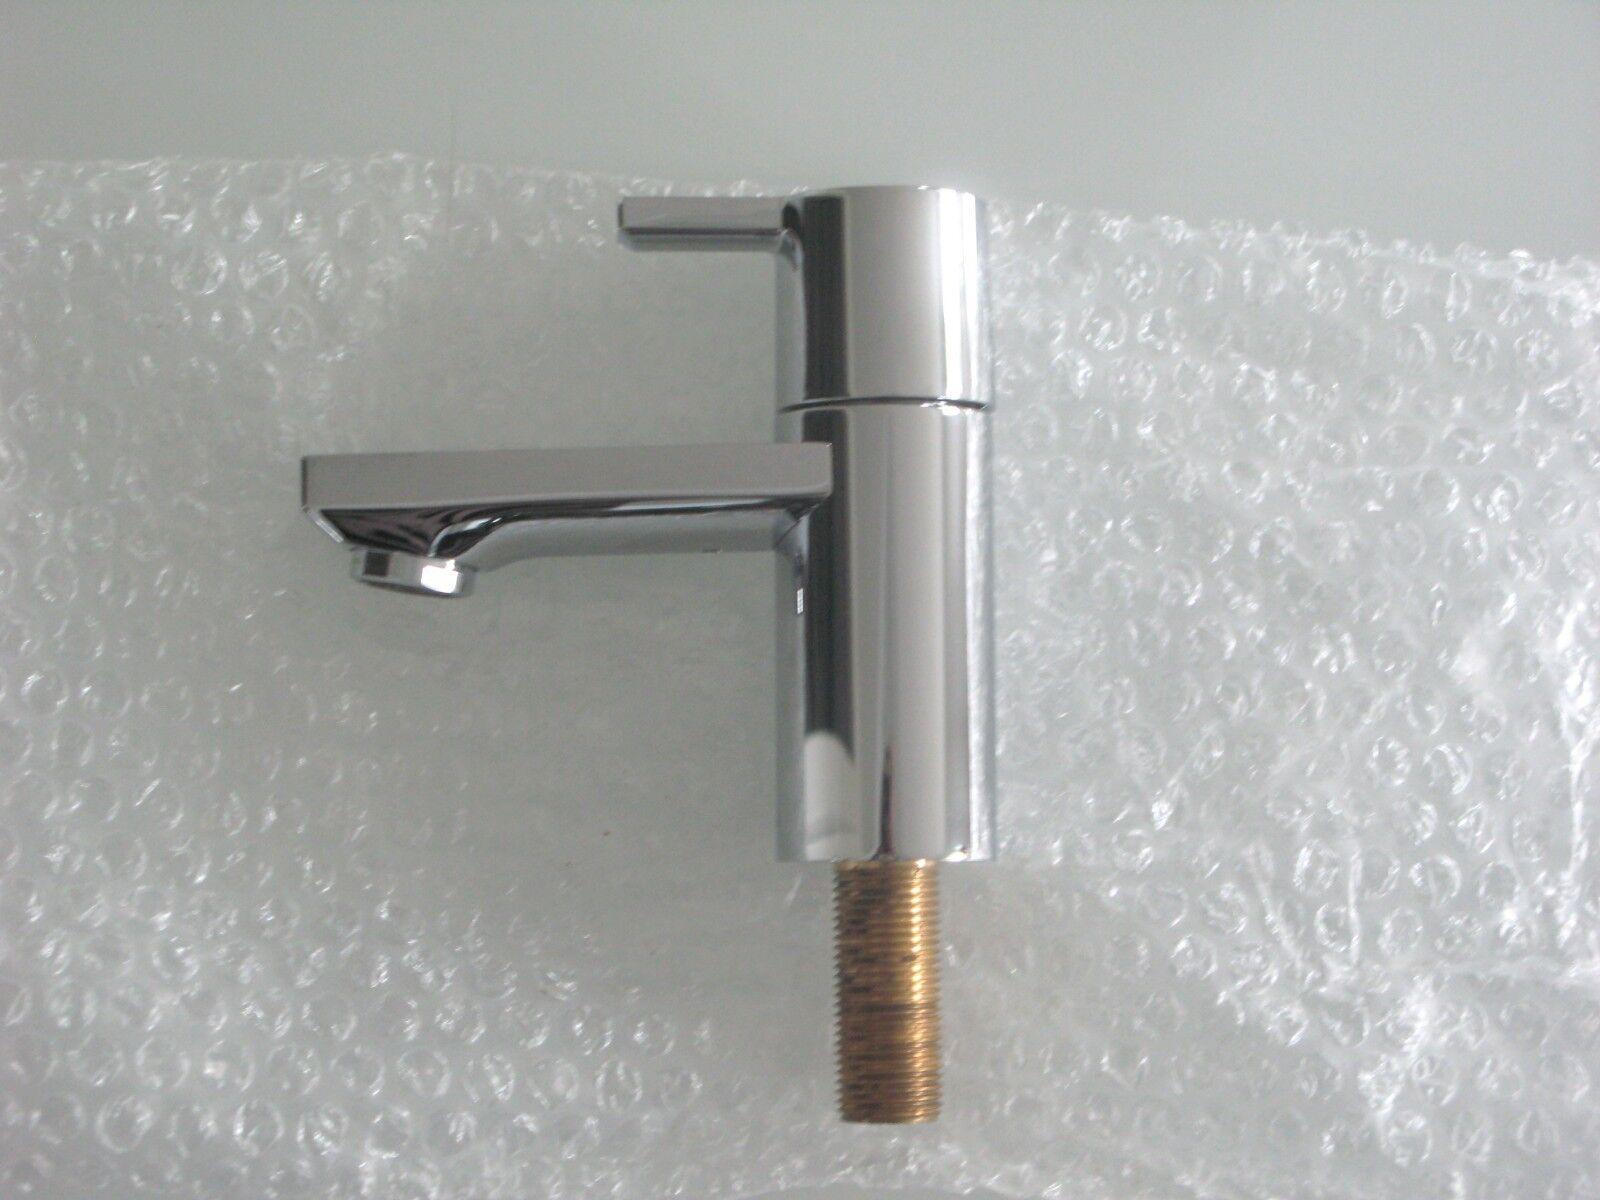 Standventil Ideal Standard Ceraplan III,Ausladung 82mm